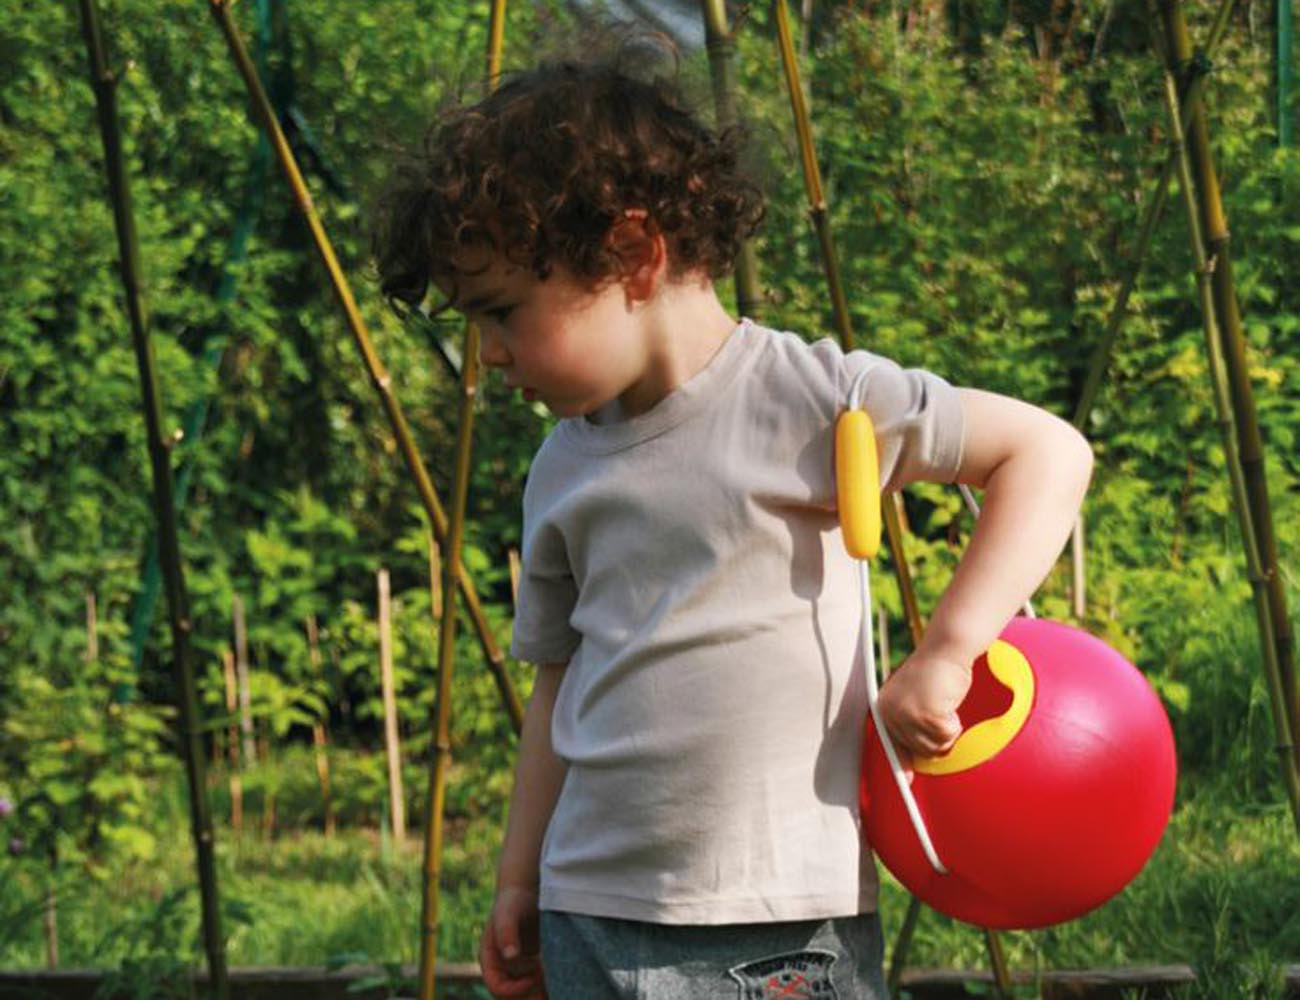 Quut Ballo Beach Toy – Smart Water Bucket For Beach Times